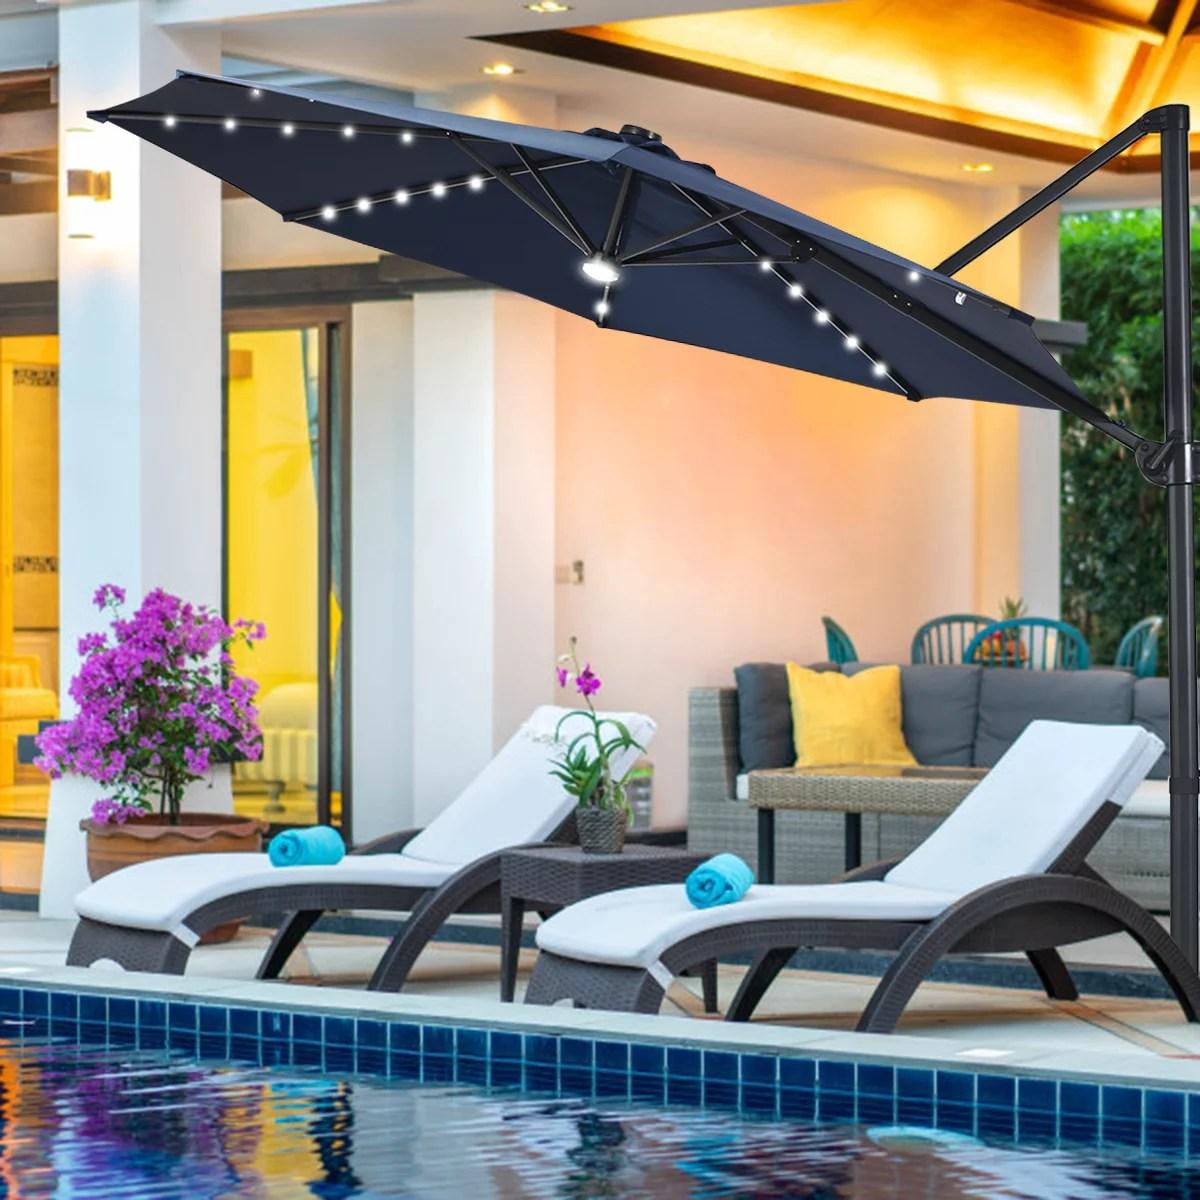 10ft solar led cantilever offset patio umbrella 360dgrees rotation aluminum